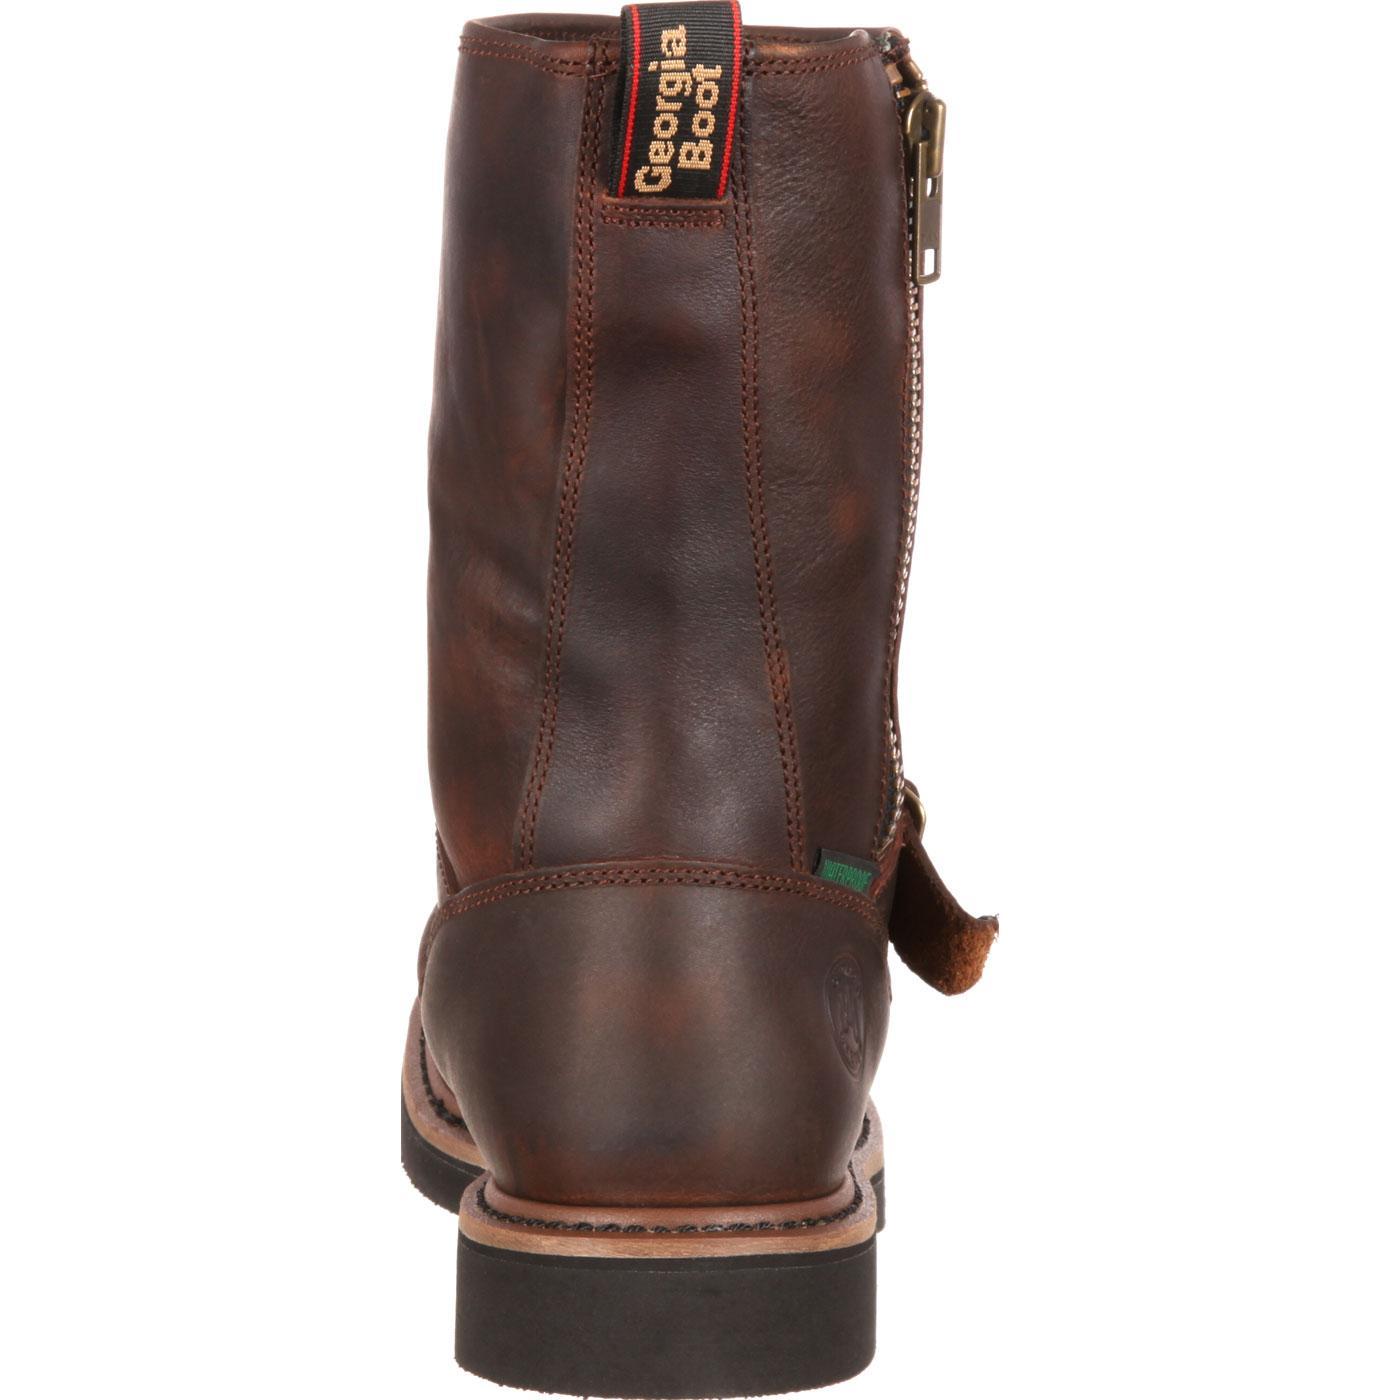 5199b455a7a Georgia Side Zip Wellington Waterproof Work Boots, #G4124